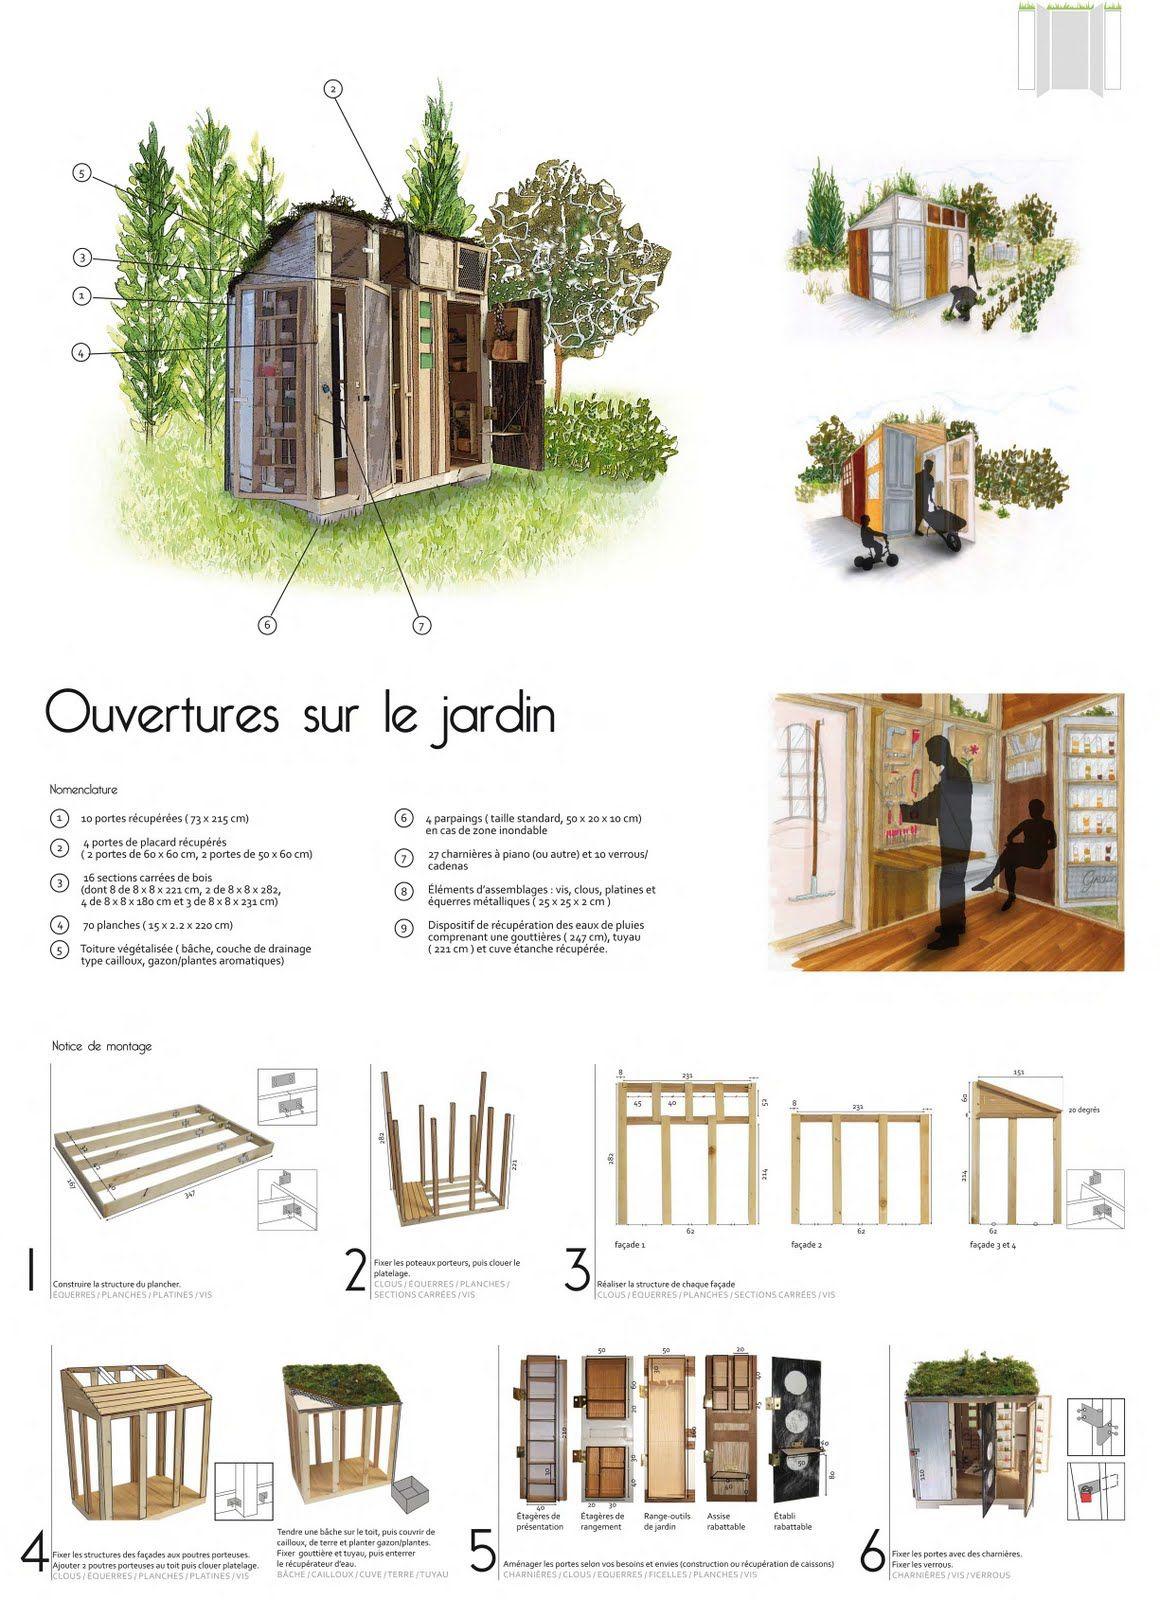 Tanatee -: 'l'abri À Bricoles' - Un Abri De Jardin À ... intérieur Construire Un Abri De Jardin En Bois Soi Meme